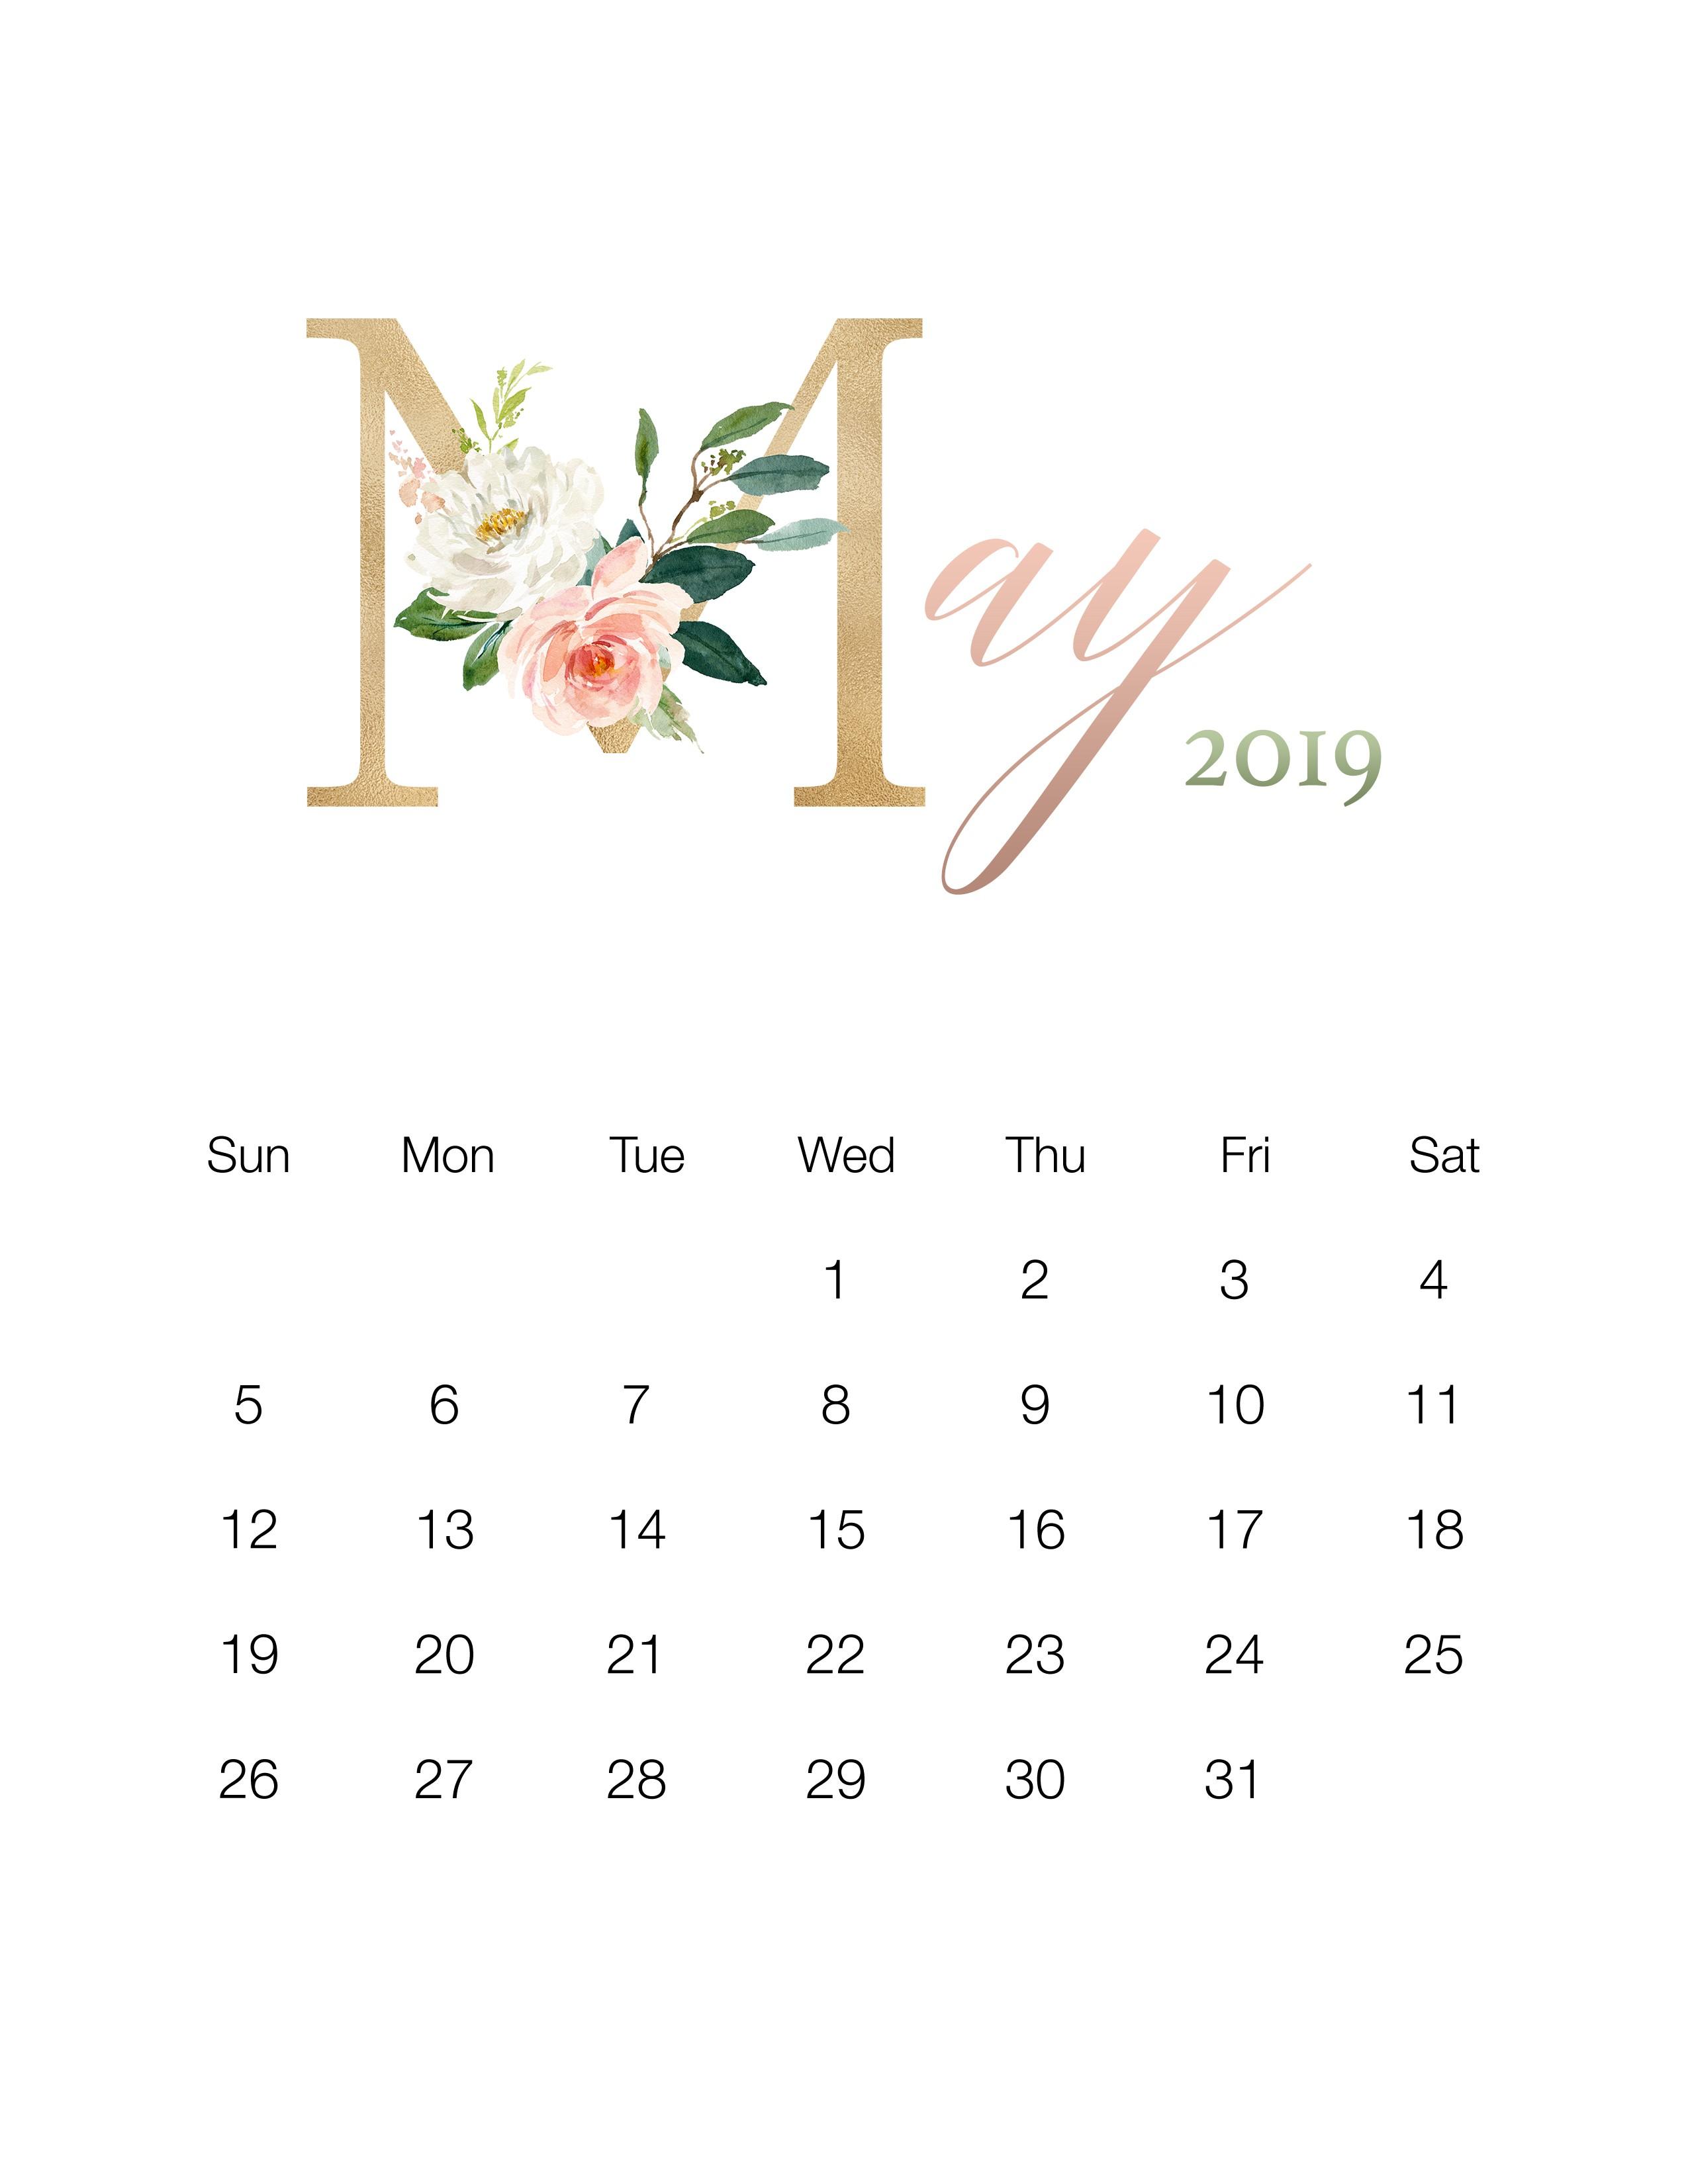 March Calendar 2019 Más Arriba-a-fecha Pretty Floral Free Printable 2019 Calendar the Cottage Market Of March Calendar 2019 Mejores Y Más Novedosos 30 Day Calendar Template Awesome Calendar 1 April 2018 to 31 March